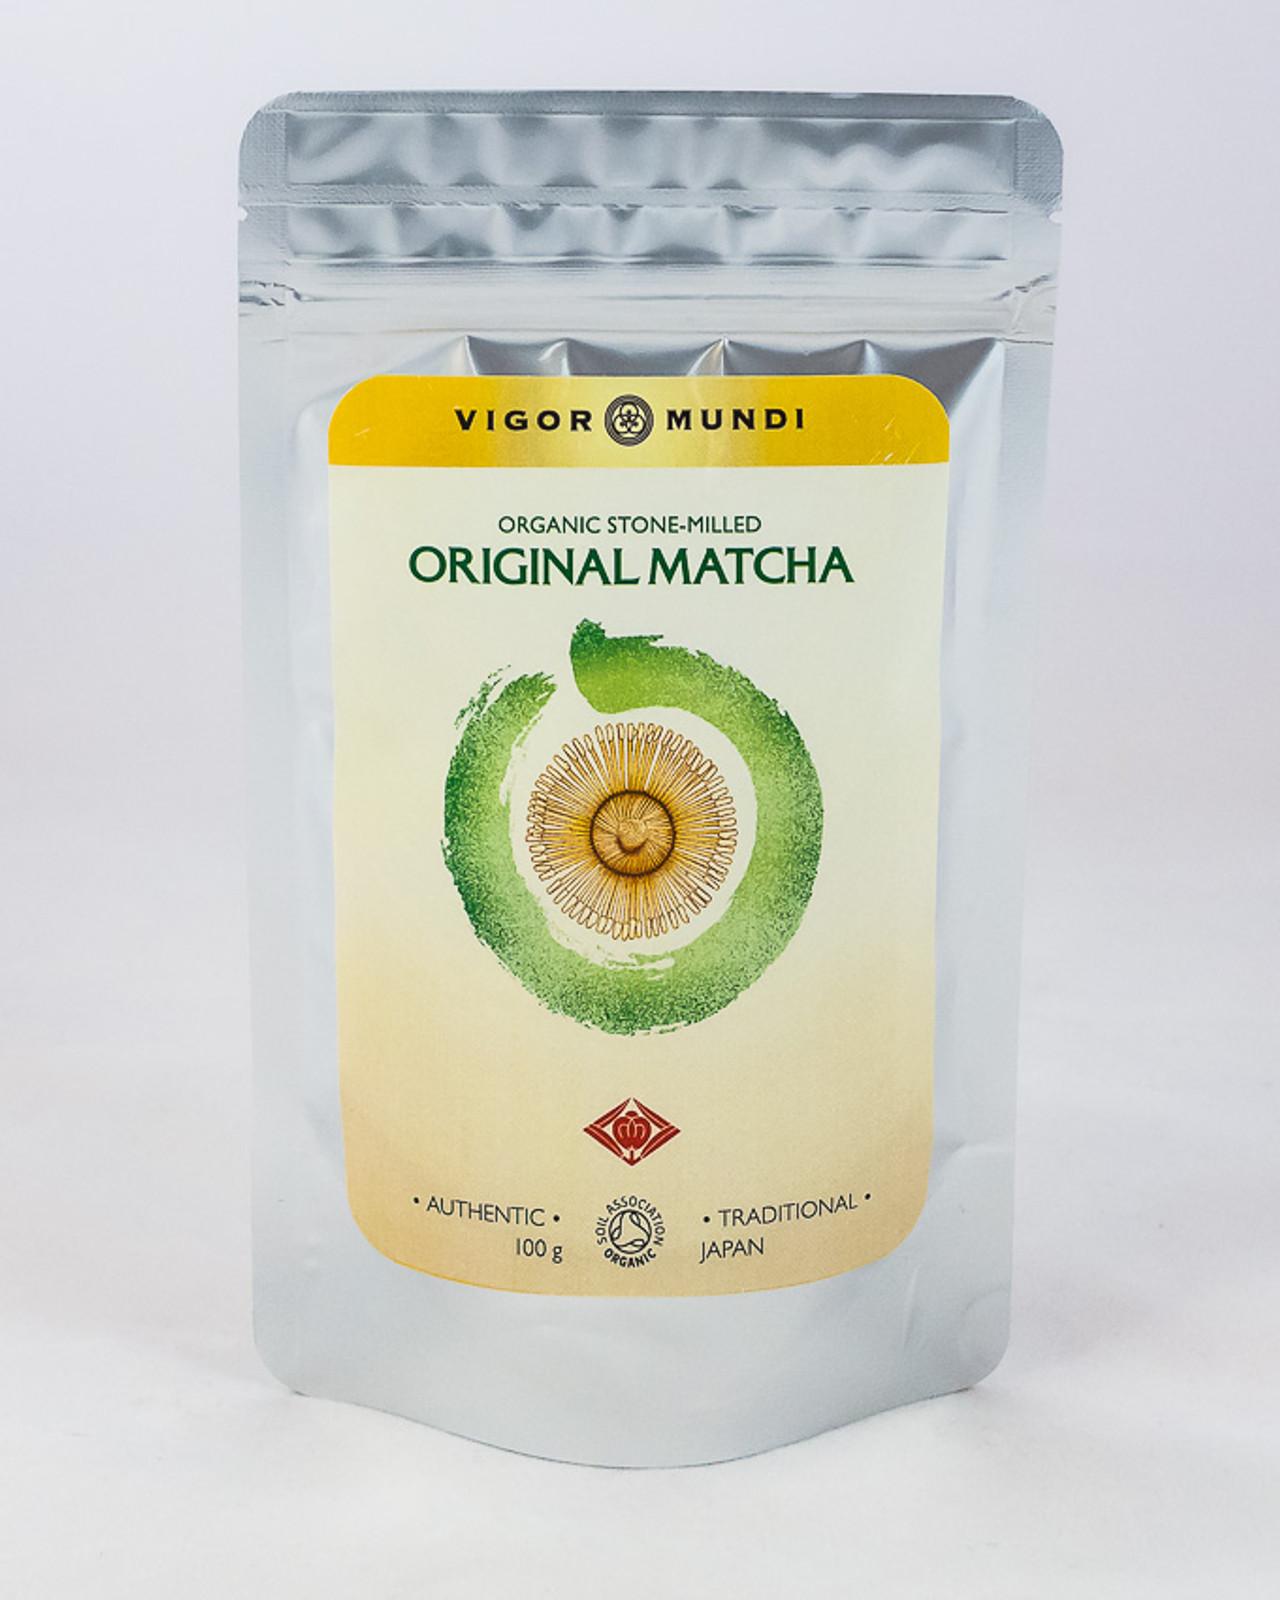 Raw Organic Stone-milled Original Matcha